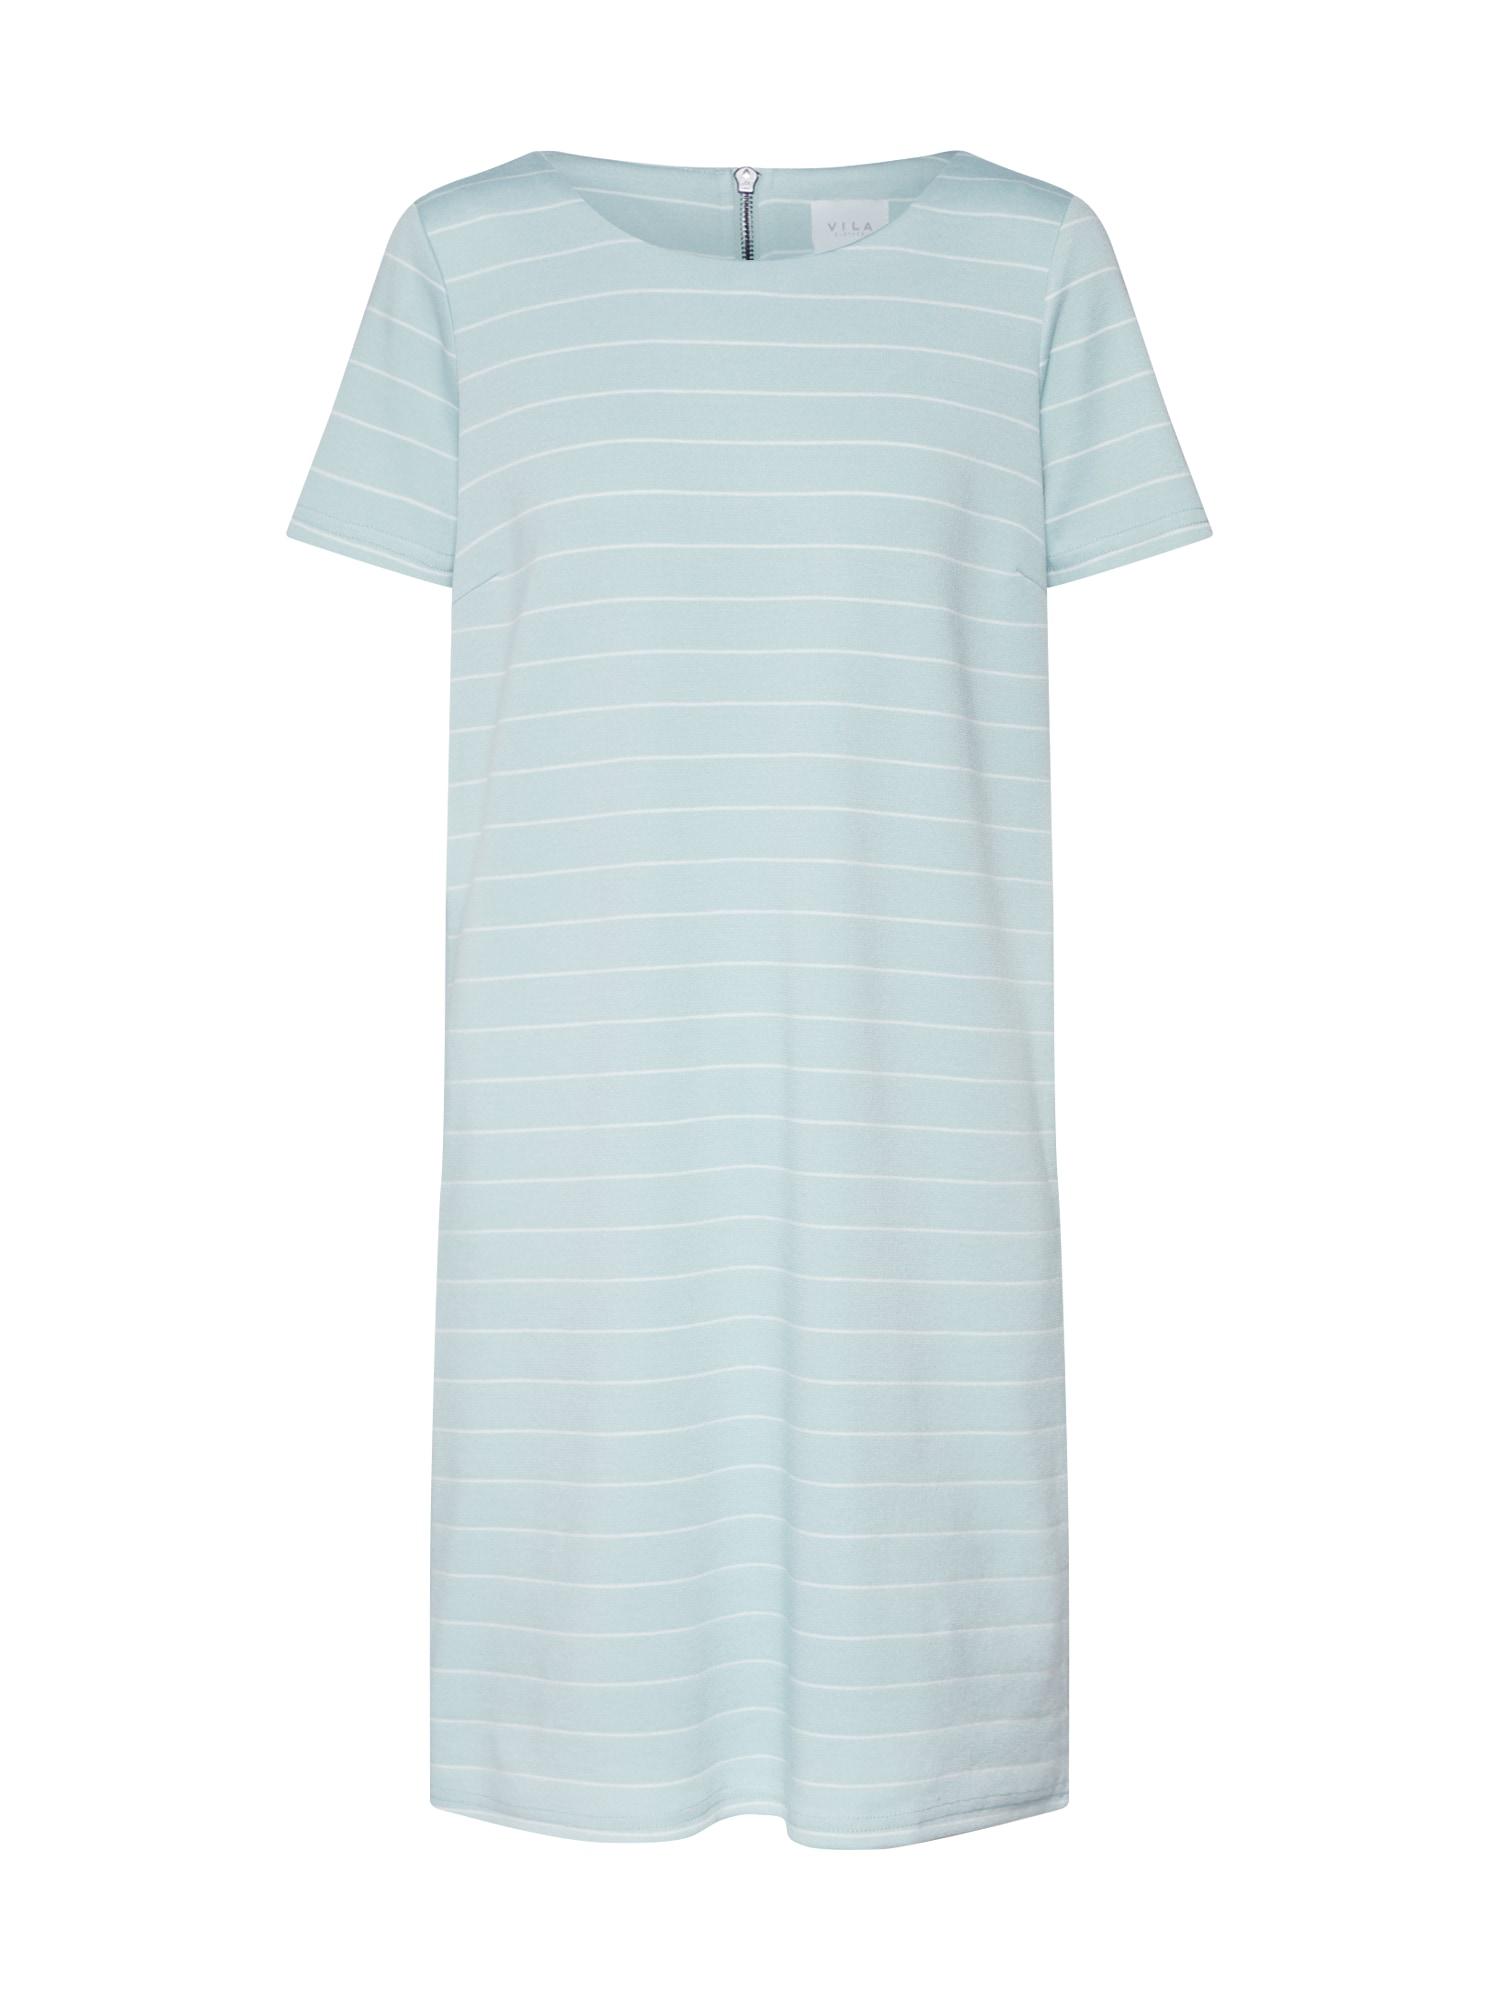 Šaty VITinny New světlemodrá bílá VILA